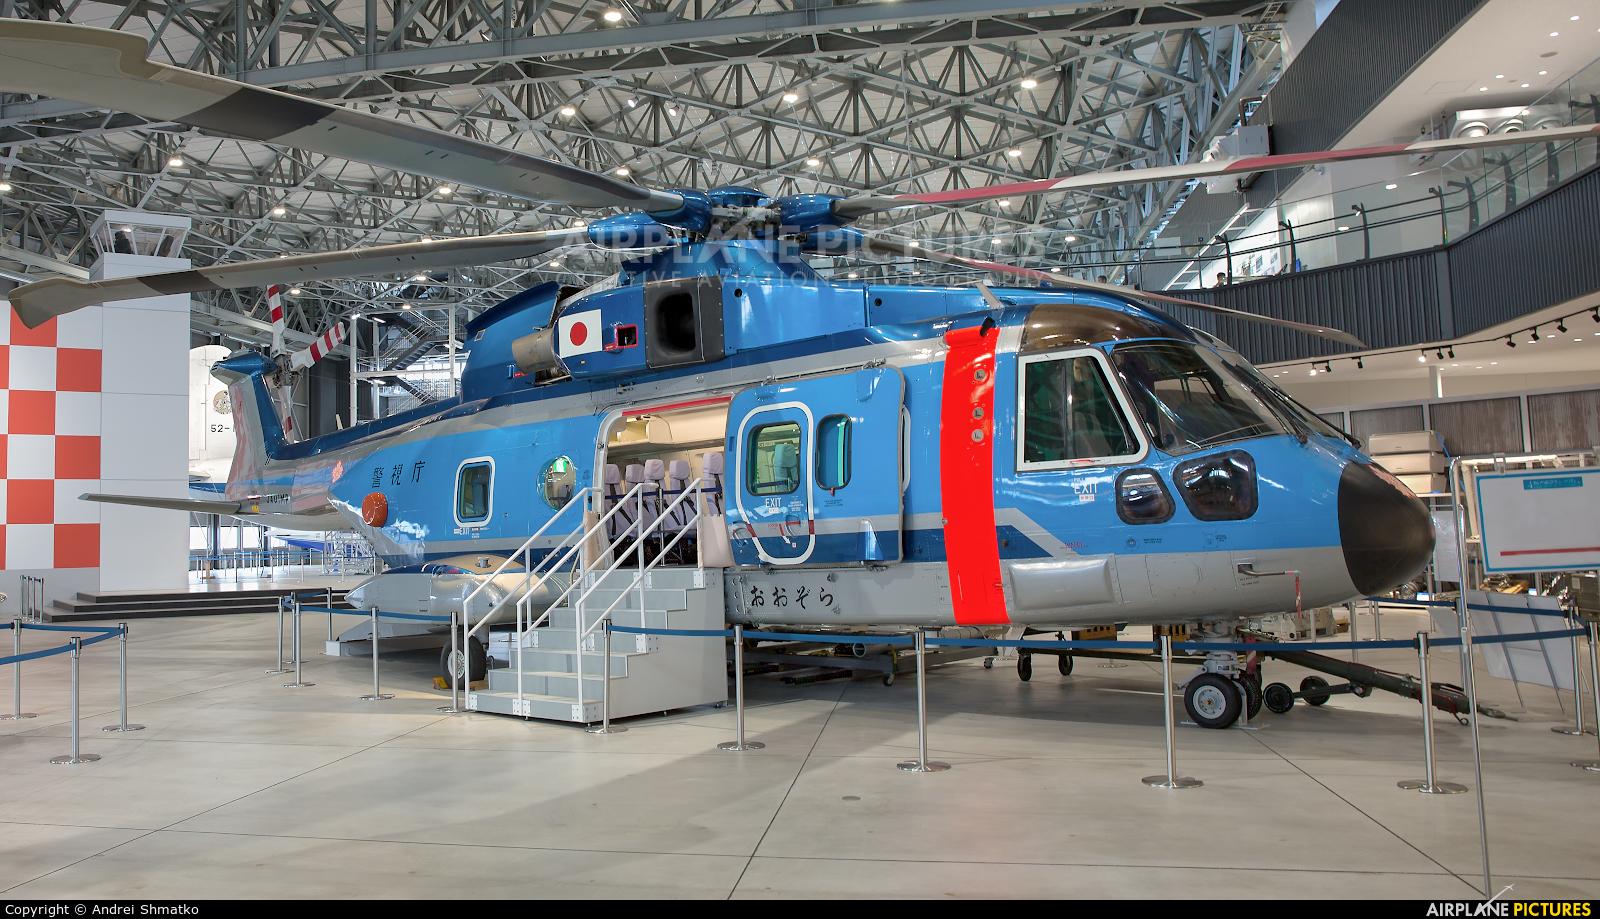 Japan - Police JA01MP aircraft at Nagoya - Komaki AB